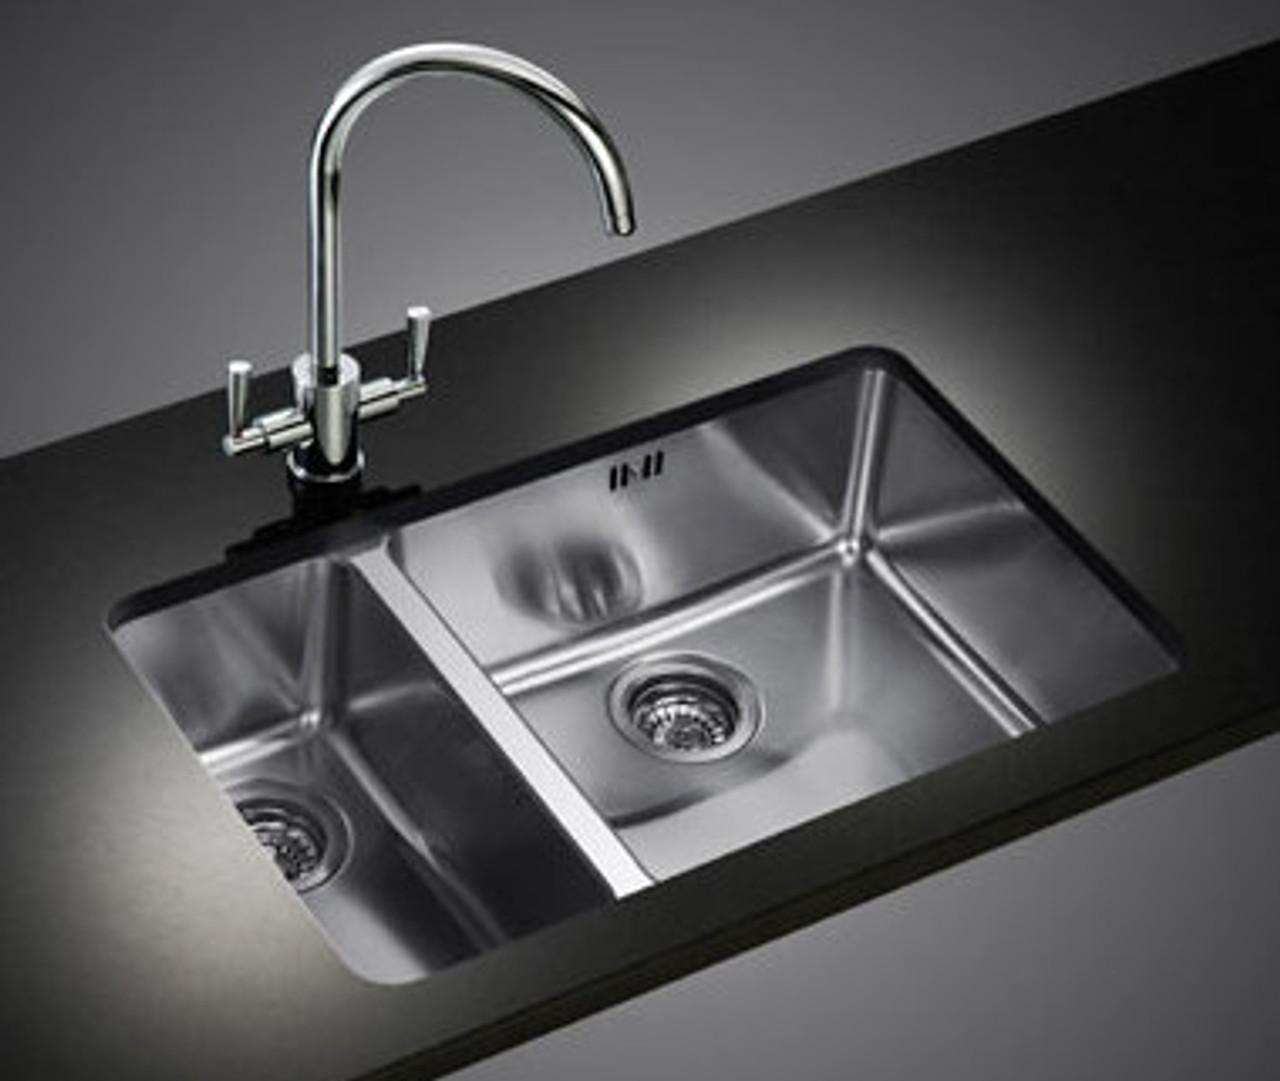 Franke Kubus KBX160 45-20 Stainless Steel Kitchen Sink - Sinks